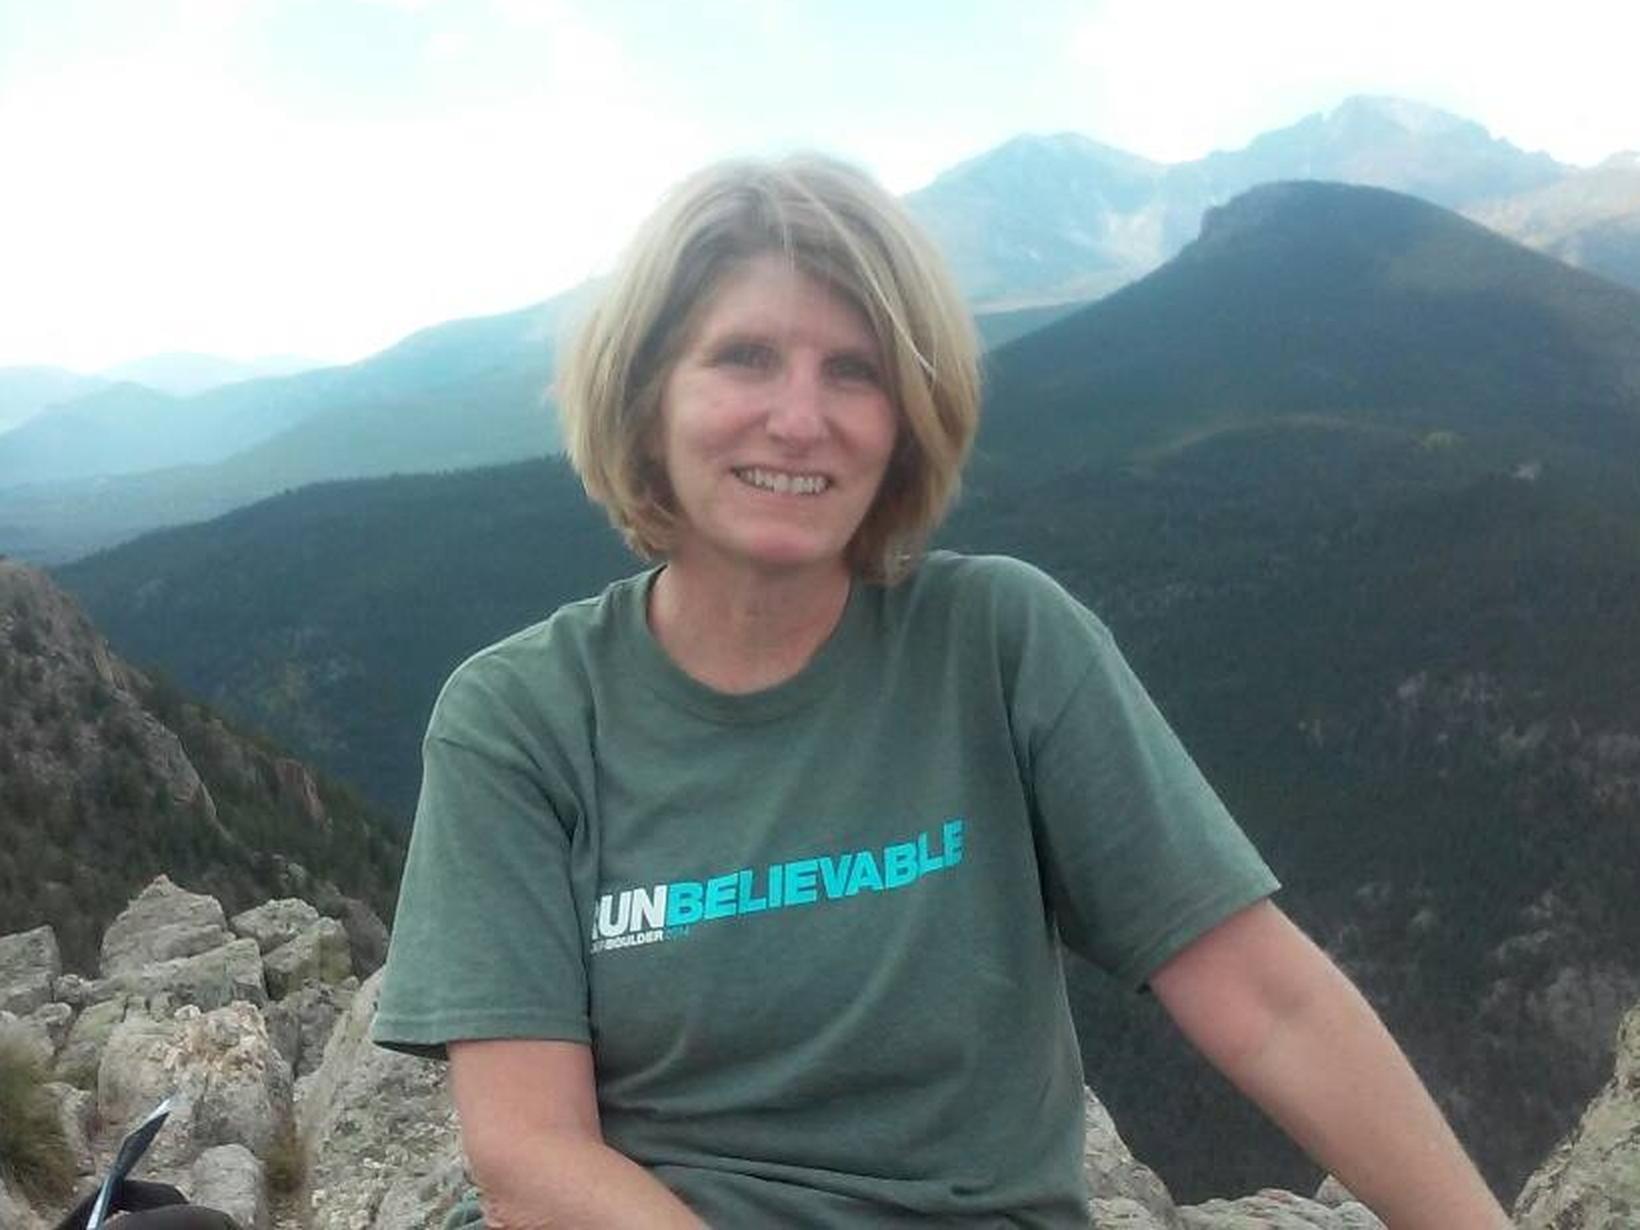 Elizabeth from Salt Lake City, Utah, United States